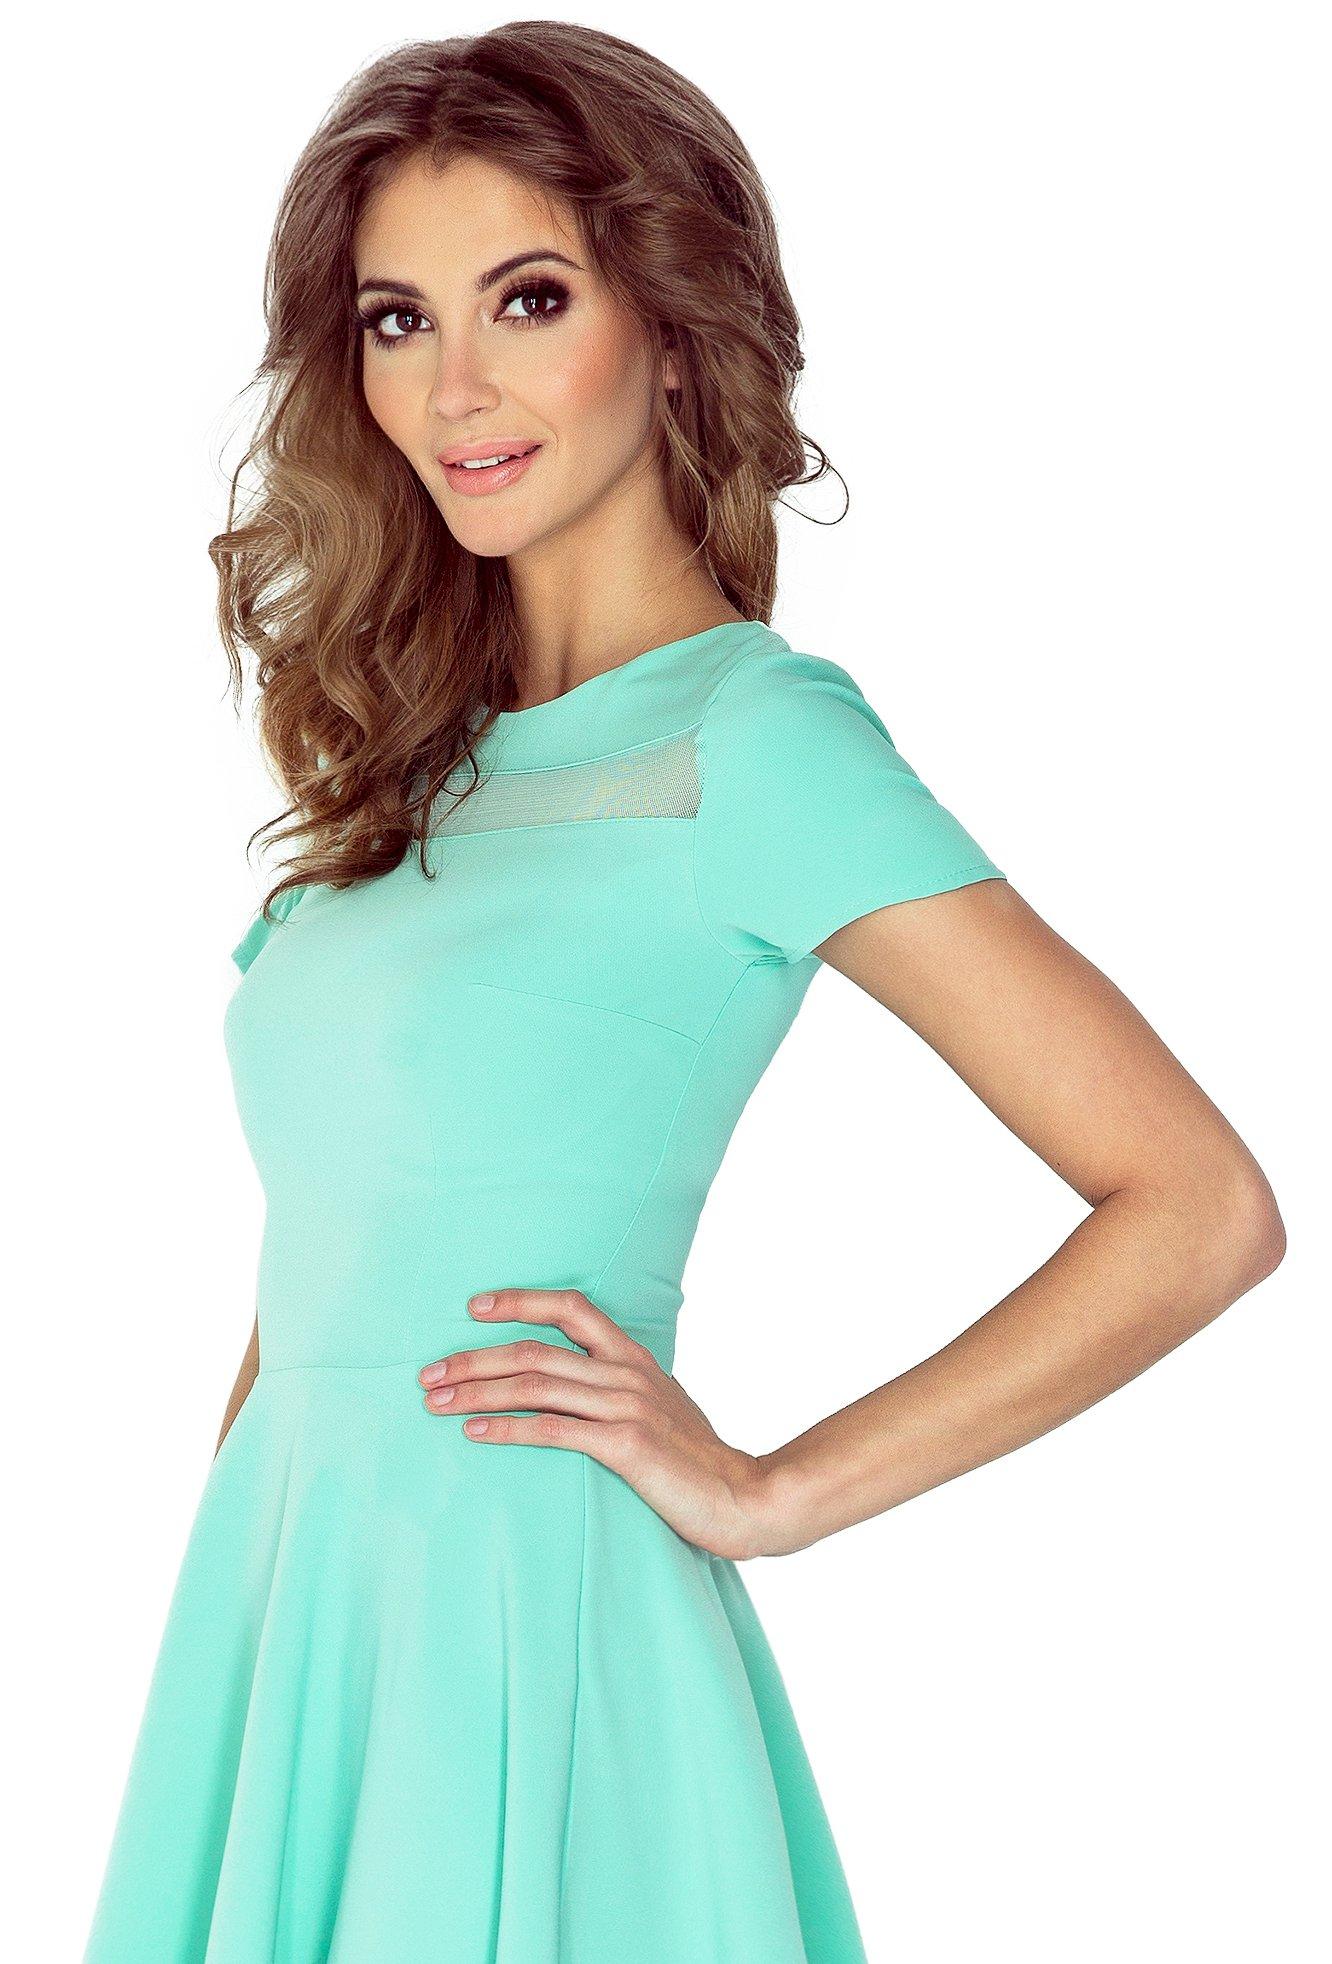 cb98739dce WIOSENNA Sukienka ROZKLOSZOWANA Morimia 003-1 L 40 - 7231069762 ...